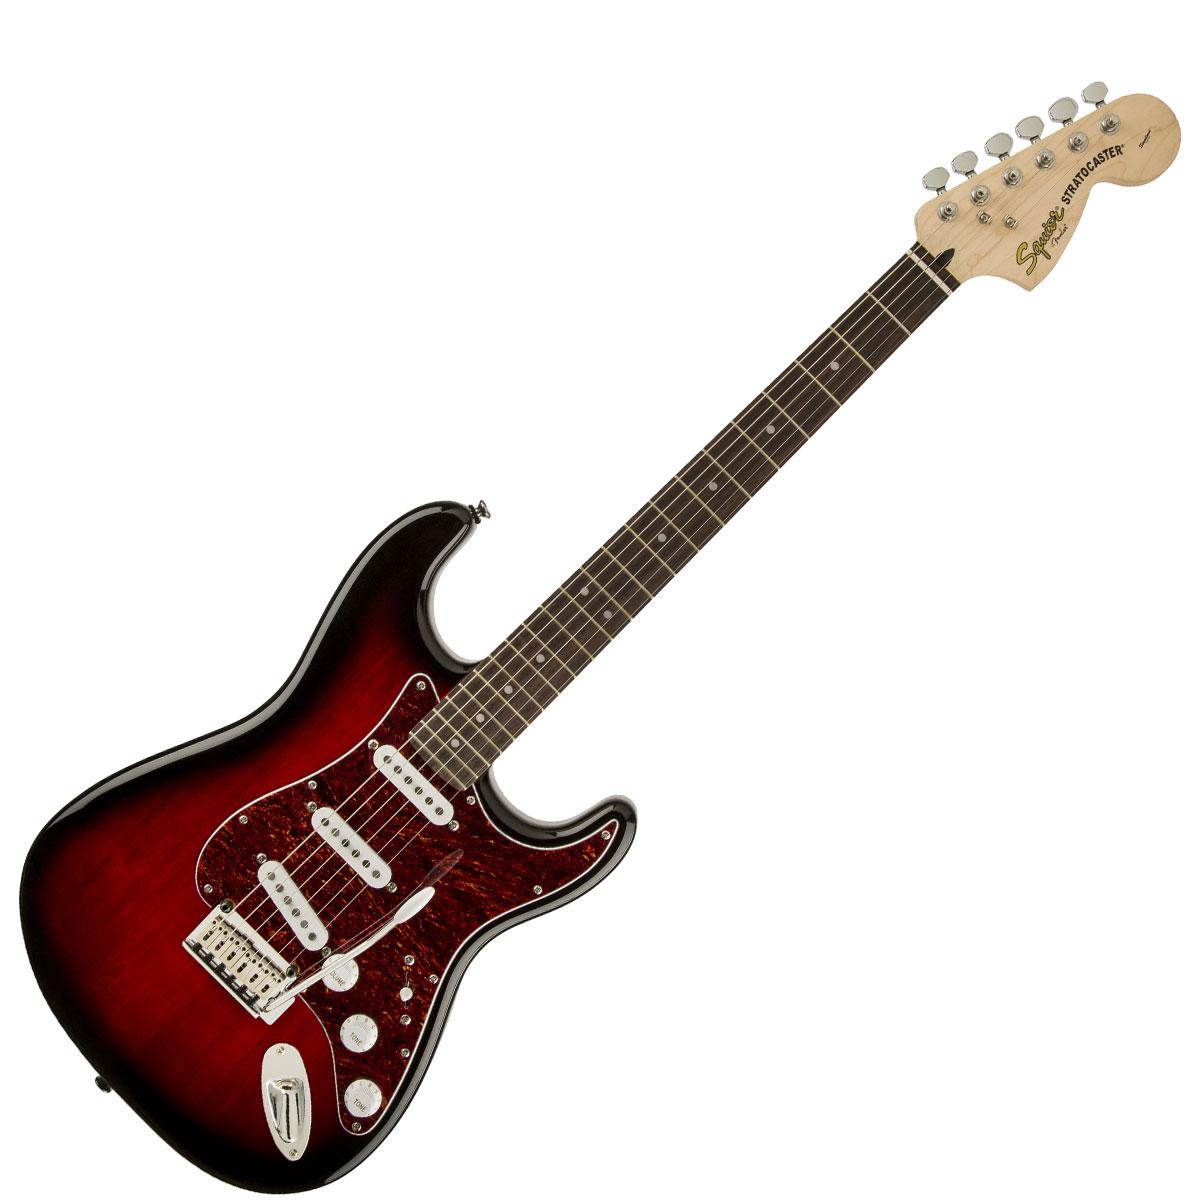 Squier Standard Stratocaster Antique